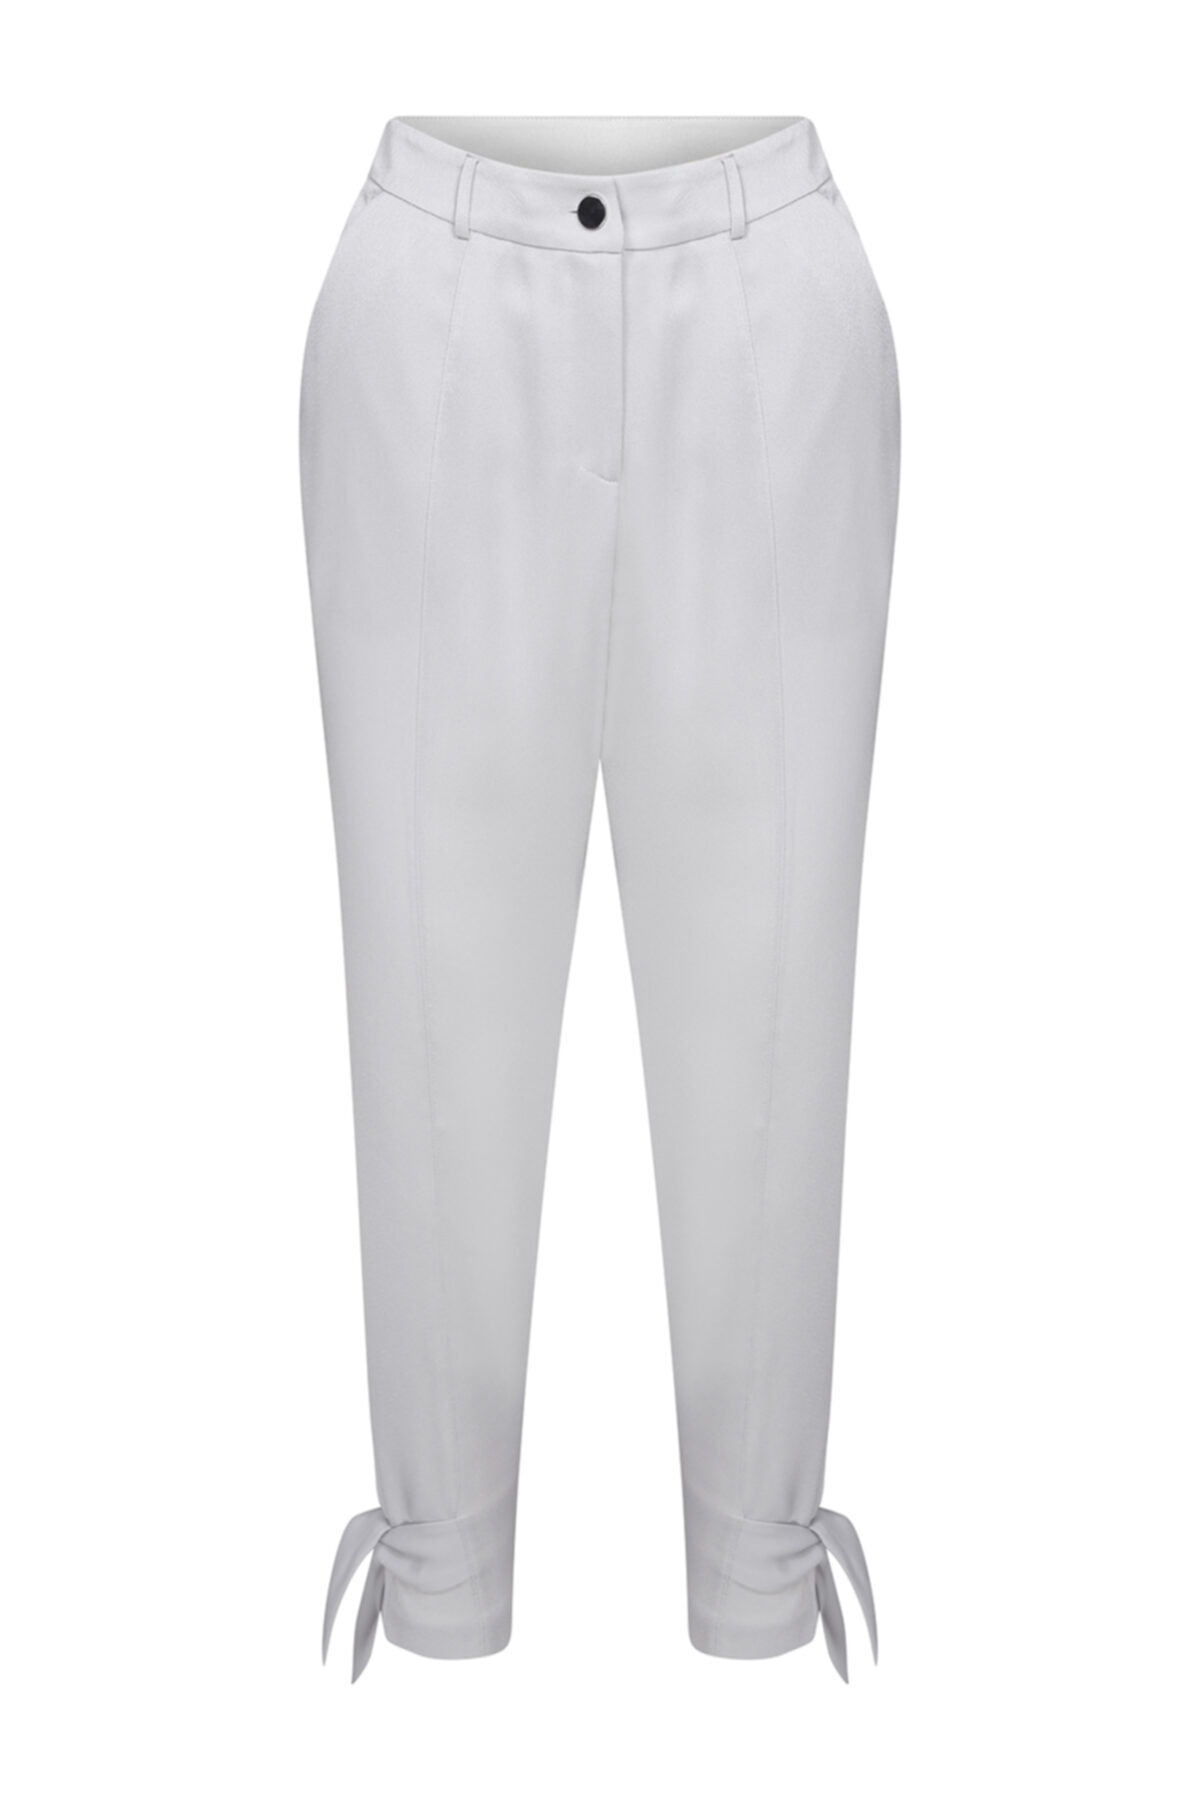 W Collection Paçası Bağlama Detaylı Pantolon 1